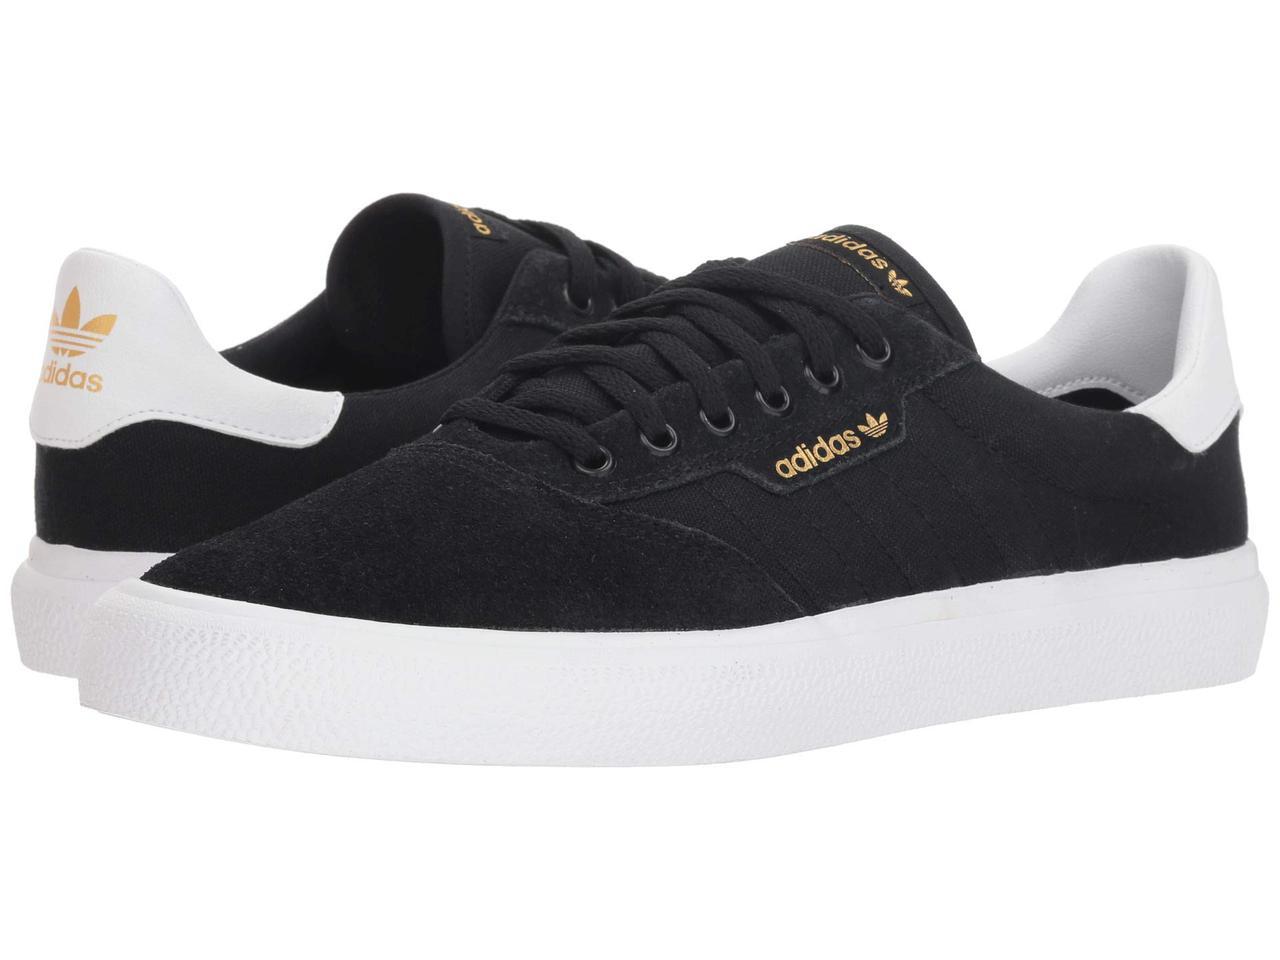 0a8424b3 Кроссовки/Кеды (Оригинал) adidas Skateboarding 3MC Black/White/Black Suede -